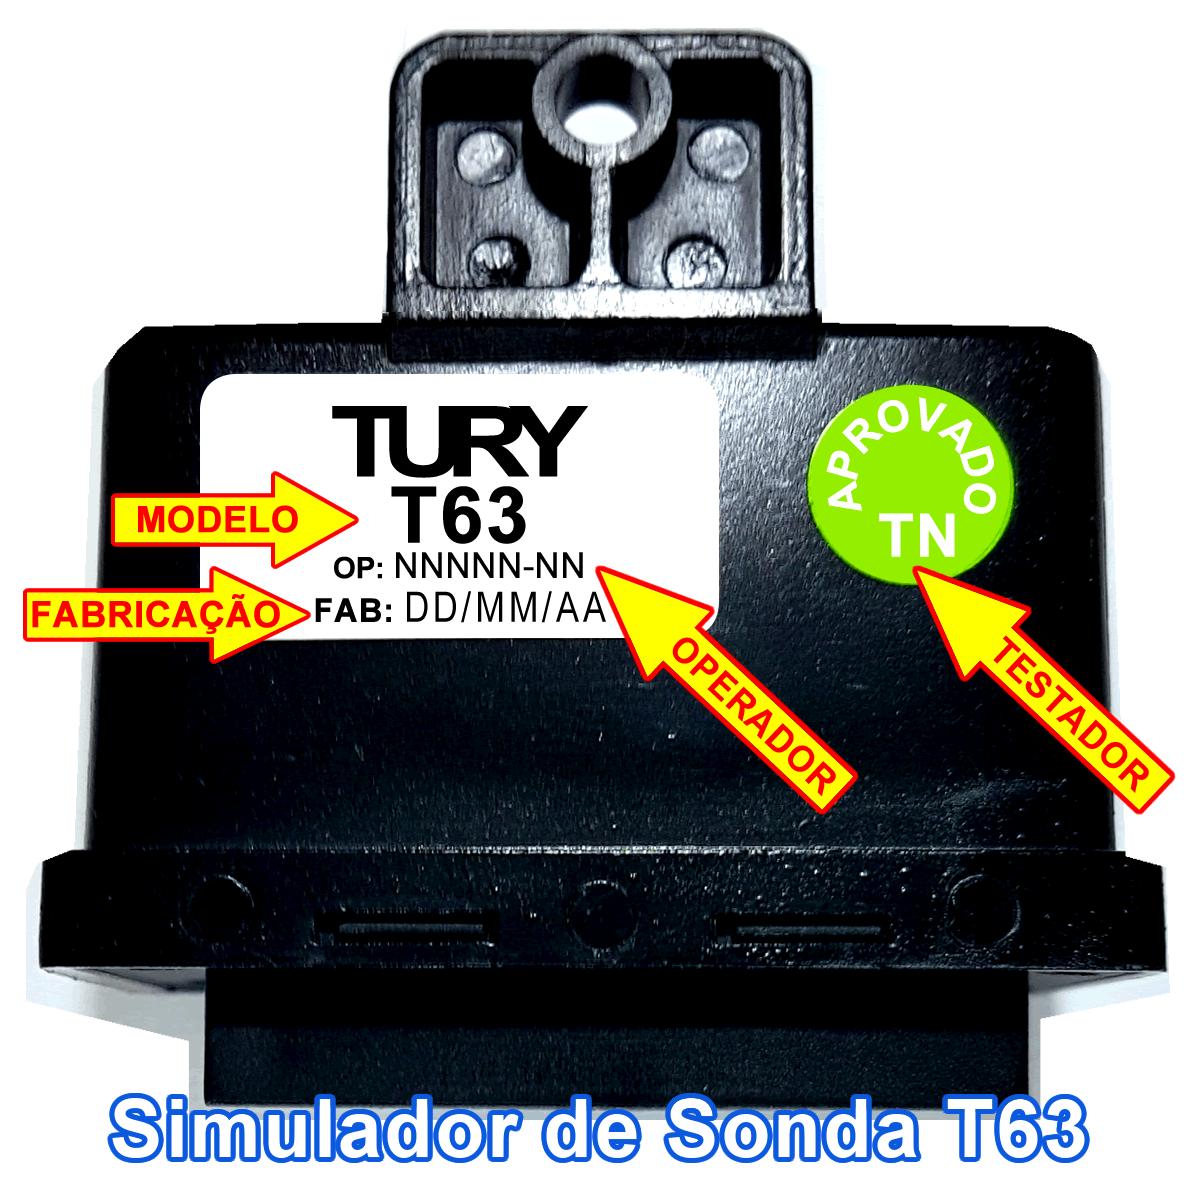 Simulador de Sonda Lambda Universal T63 TURY GAS